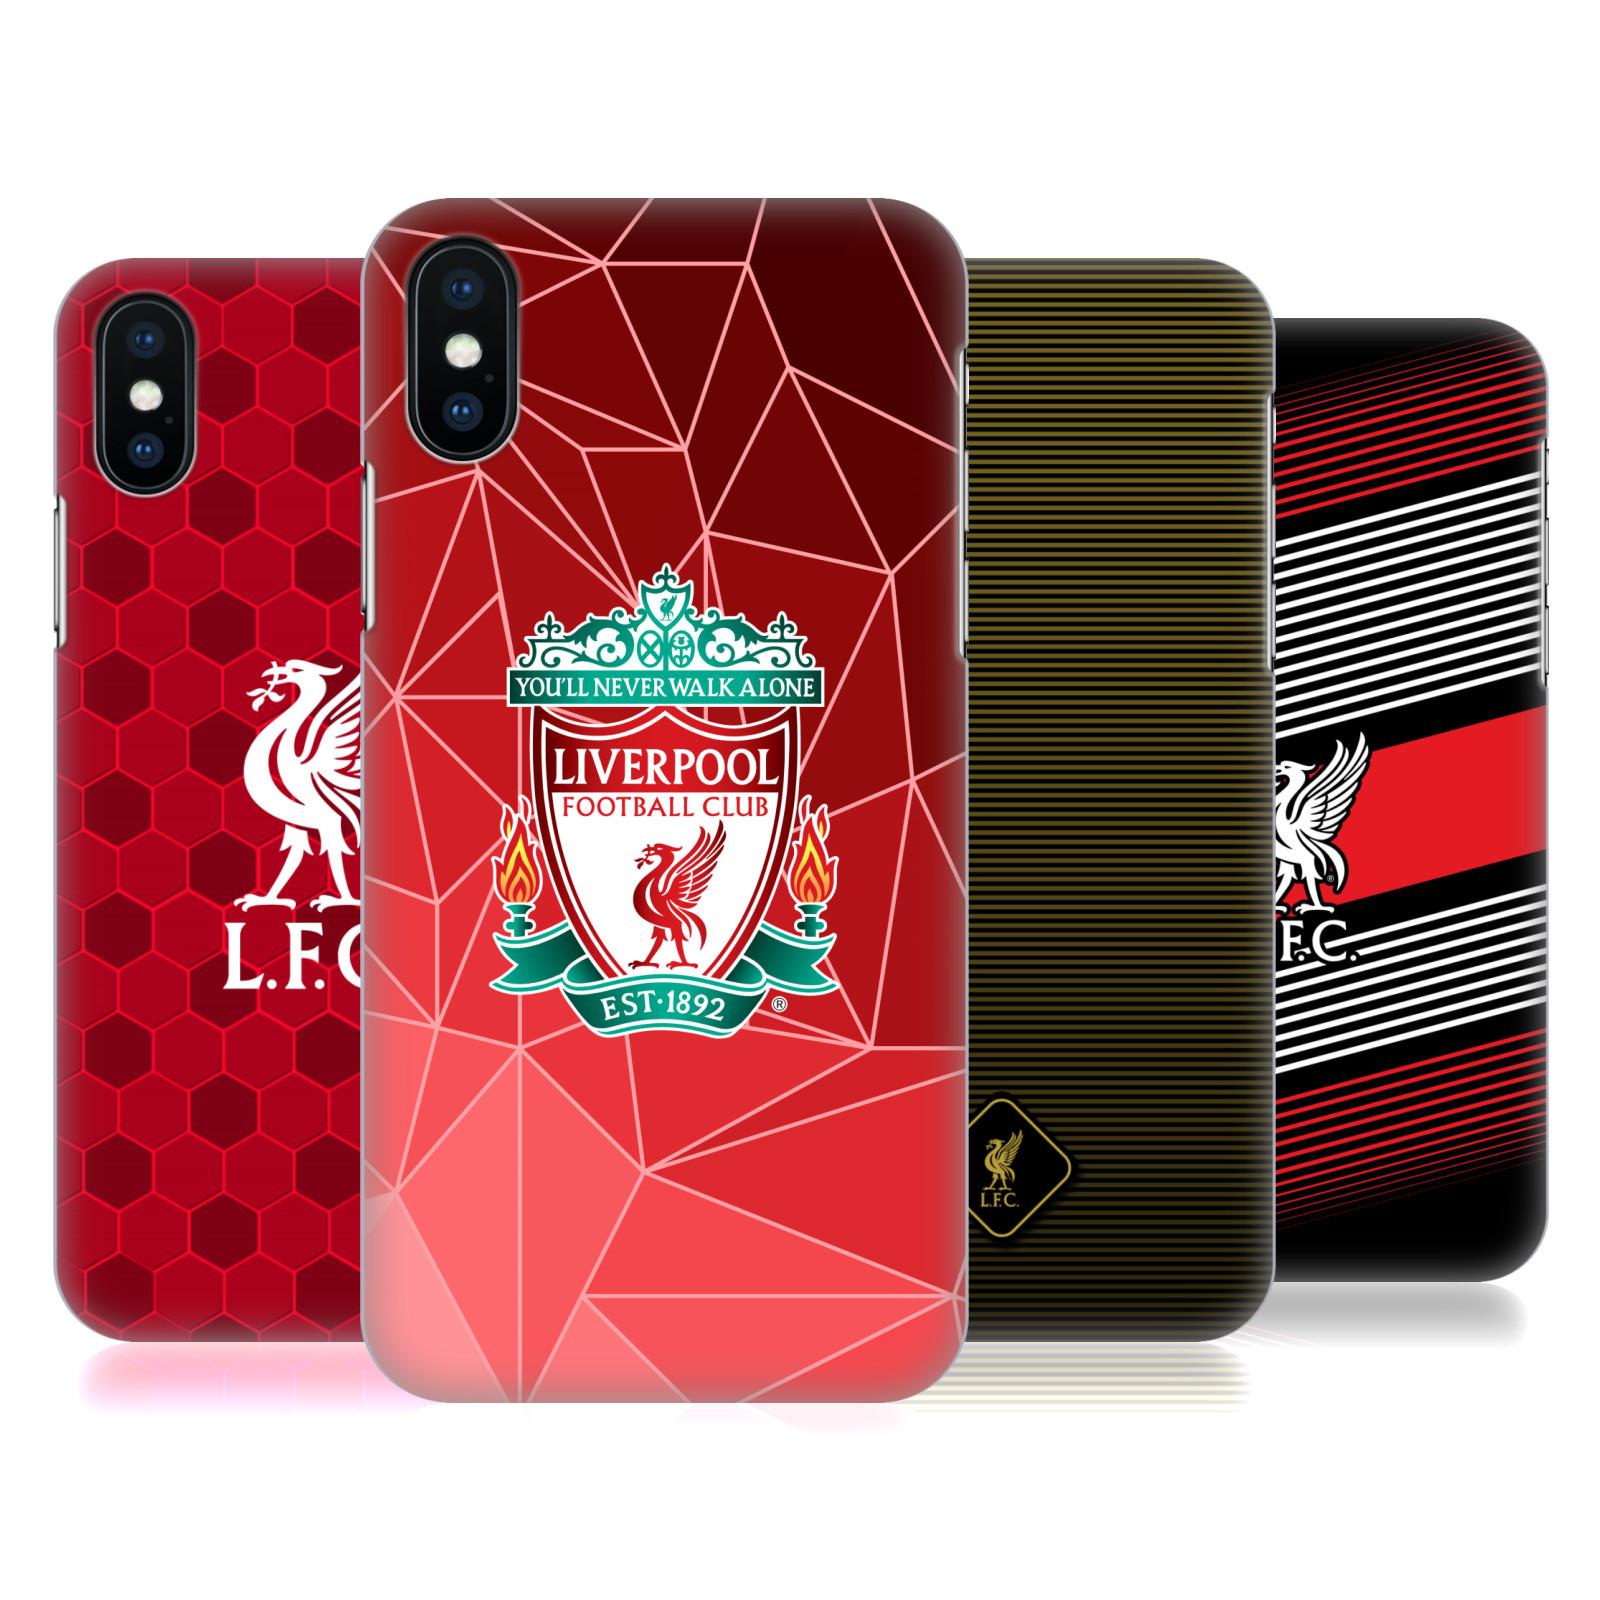 Liverpool Football Club 2018/19 Crest & Liverbird